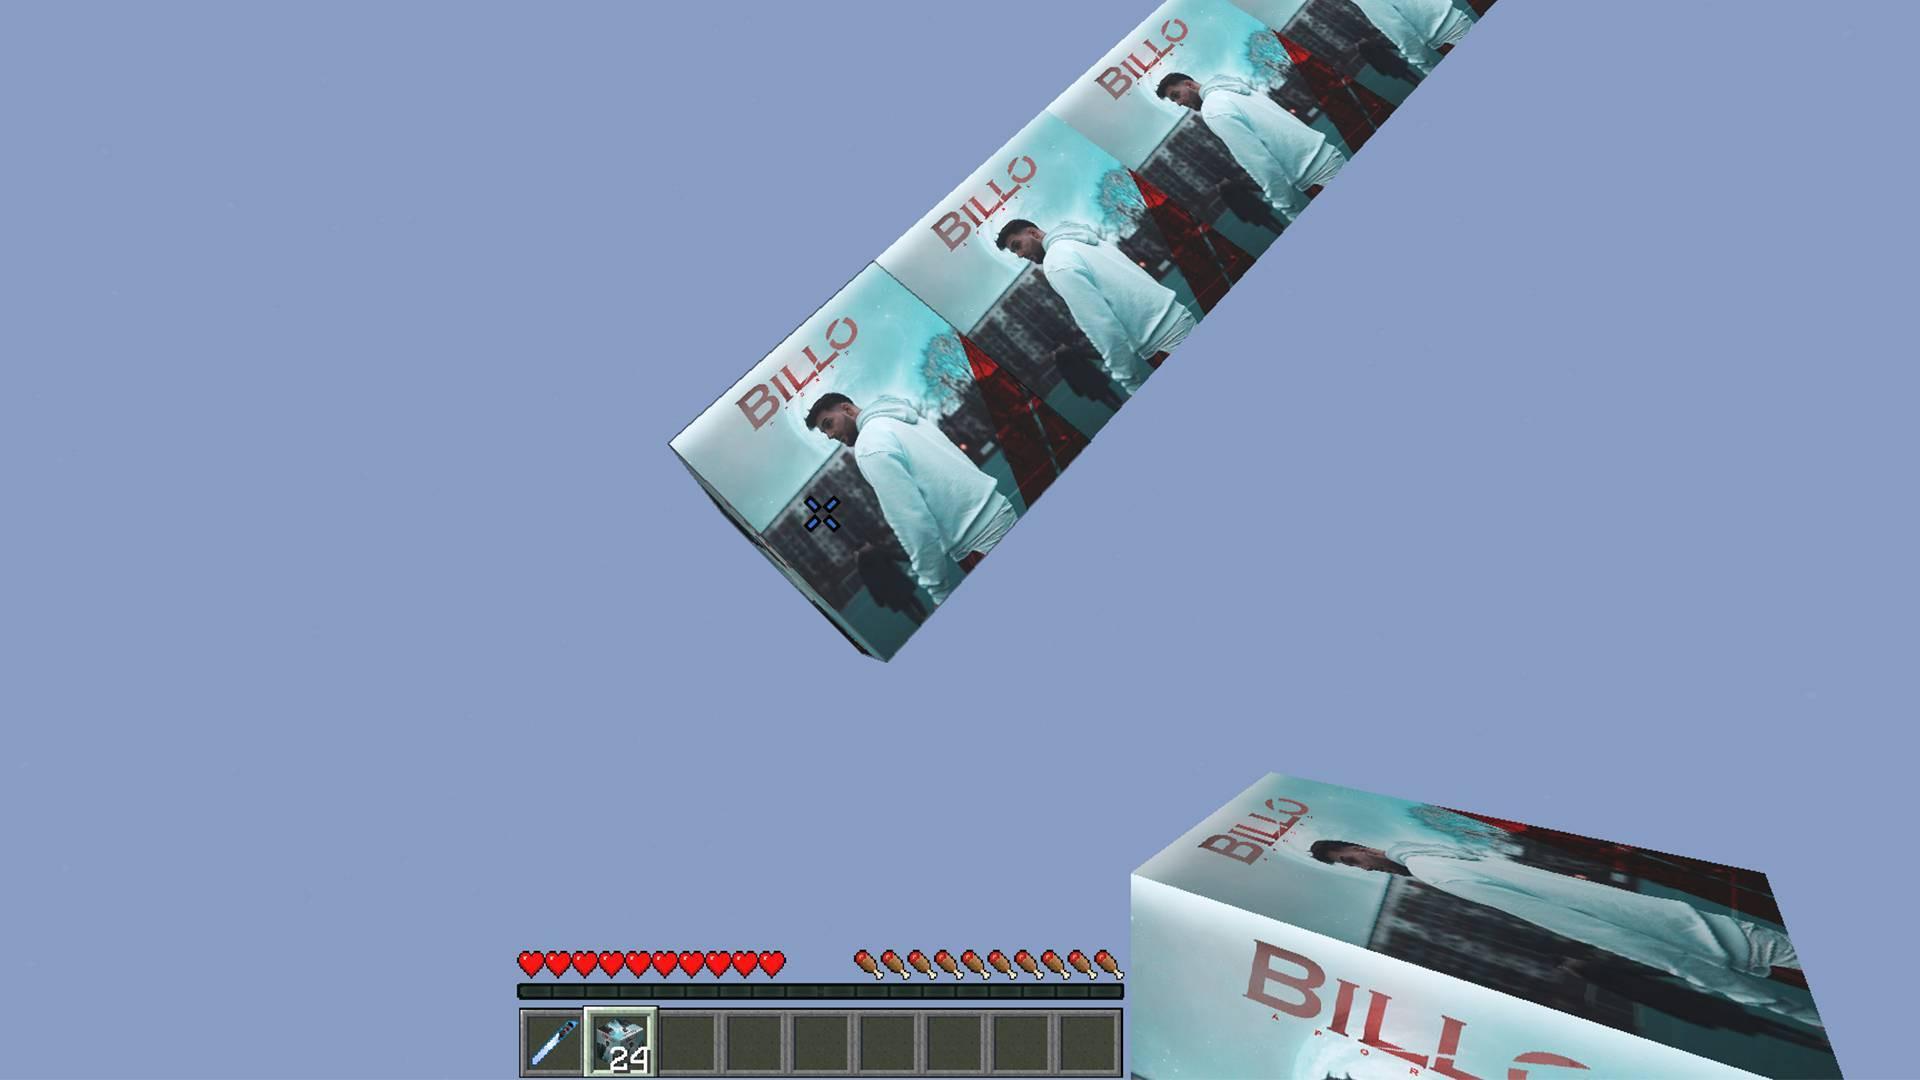 ApoRed Billo Texture Pack